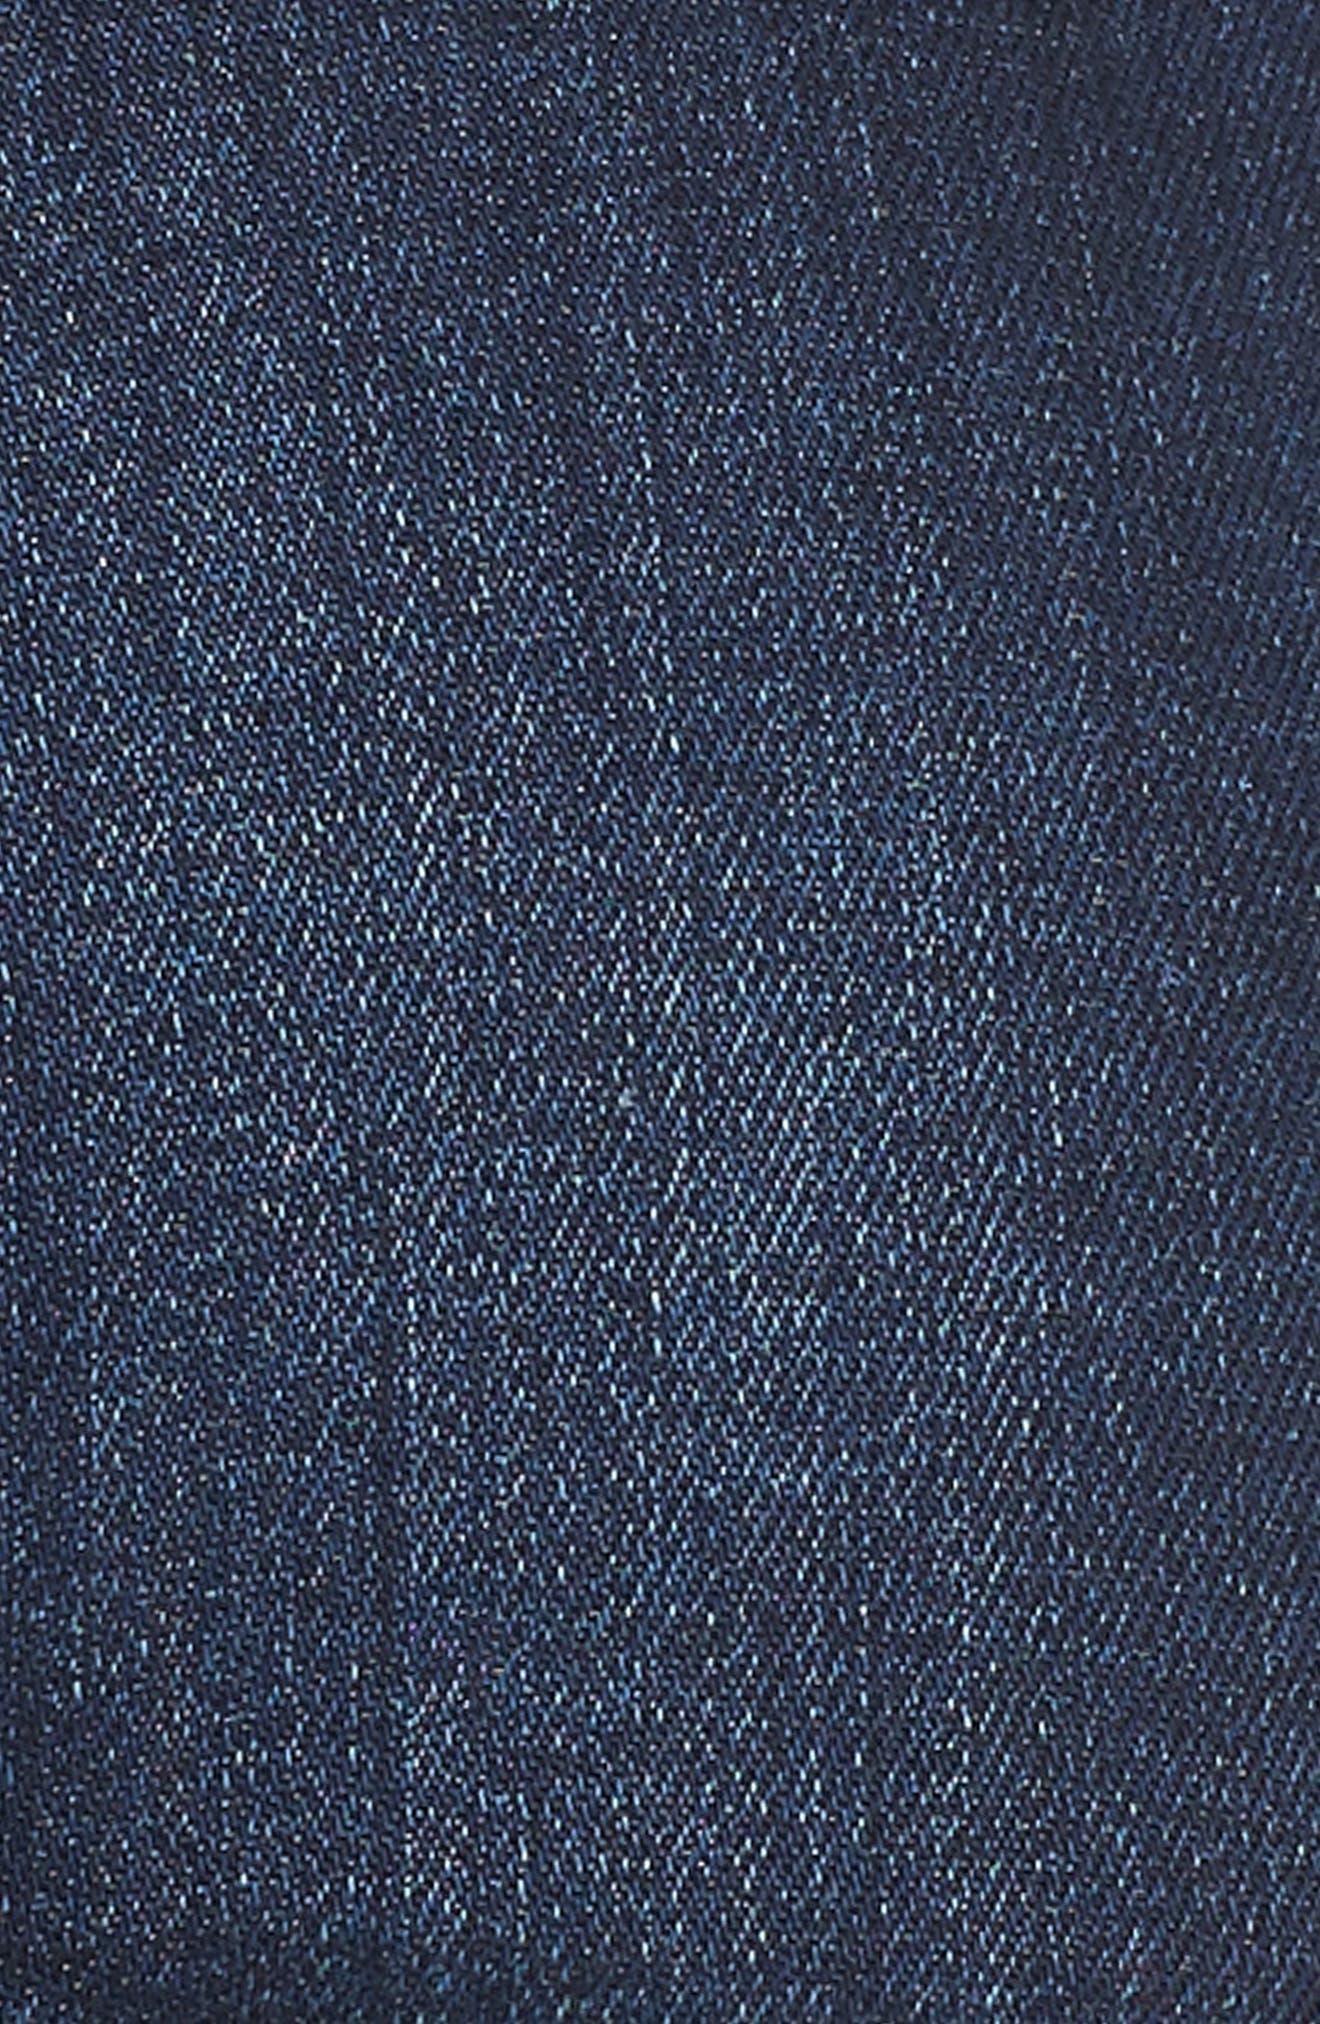 Alissa Skinny Jeans,                             Alternate thumbnail 6, color,                             Dark Supersoft